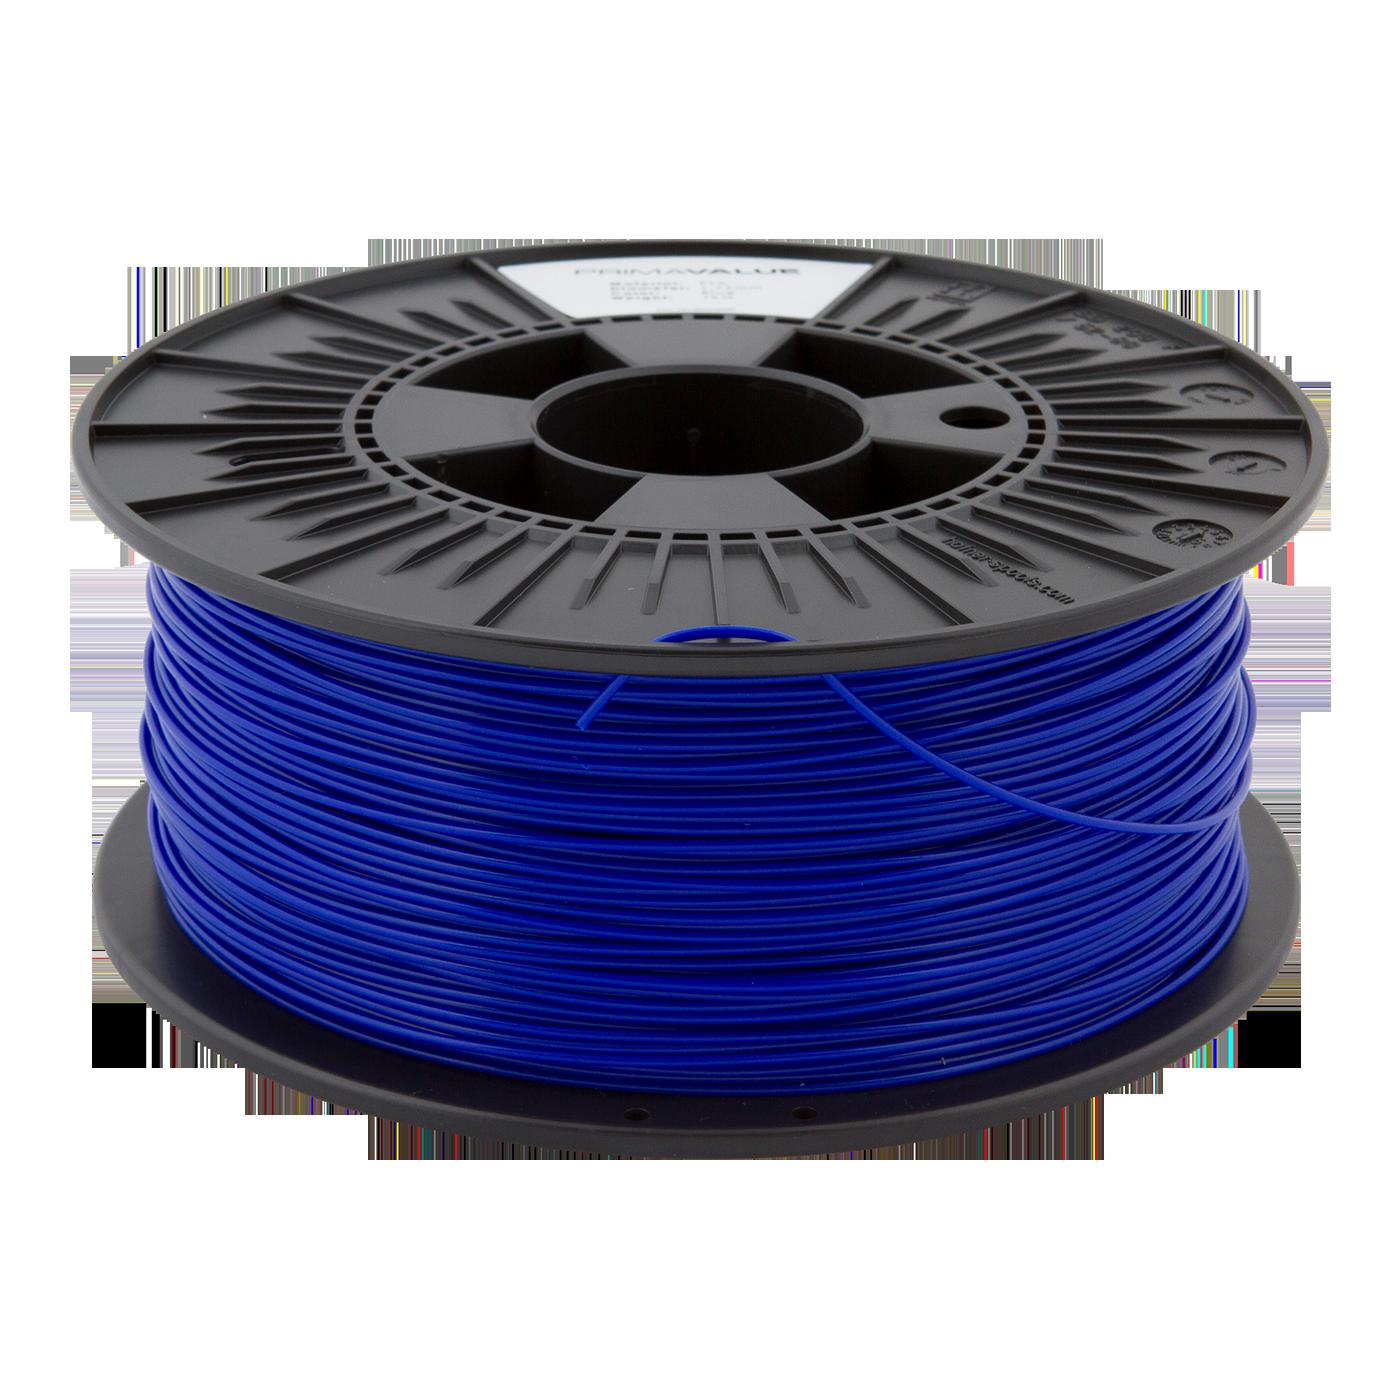 PrimaValue PLA Filament - 1.75mm - 1 kg spool